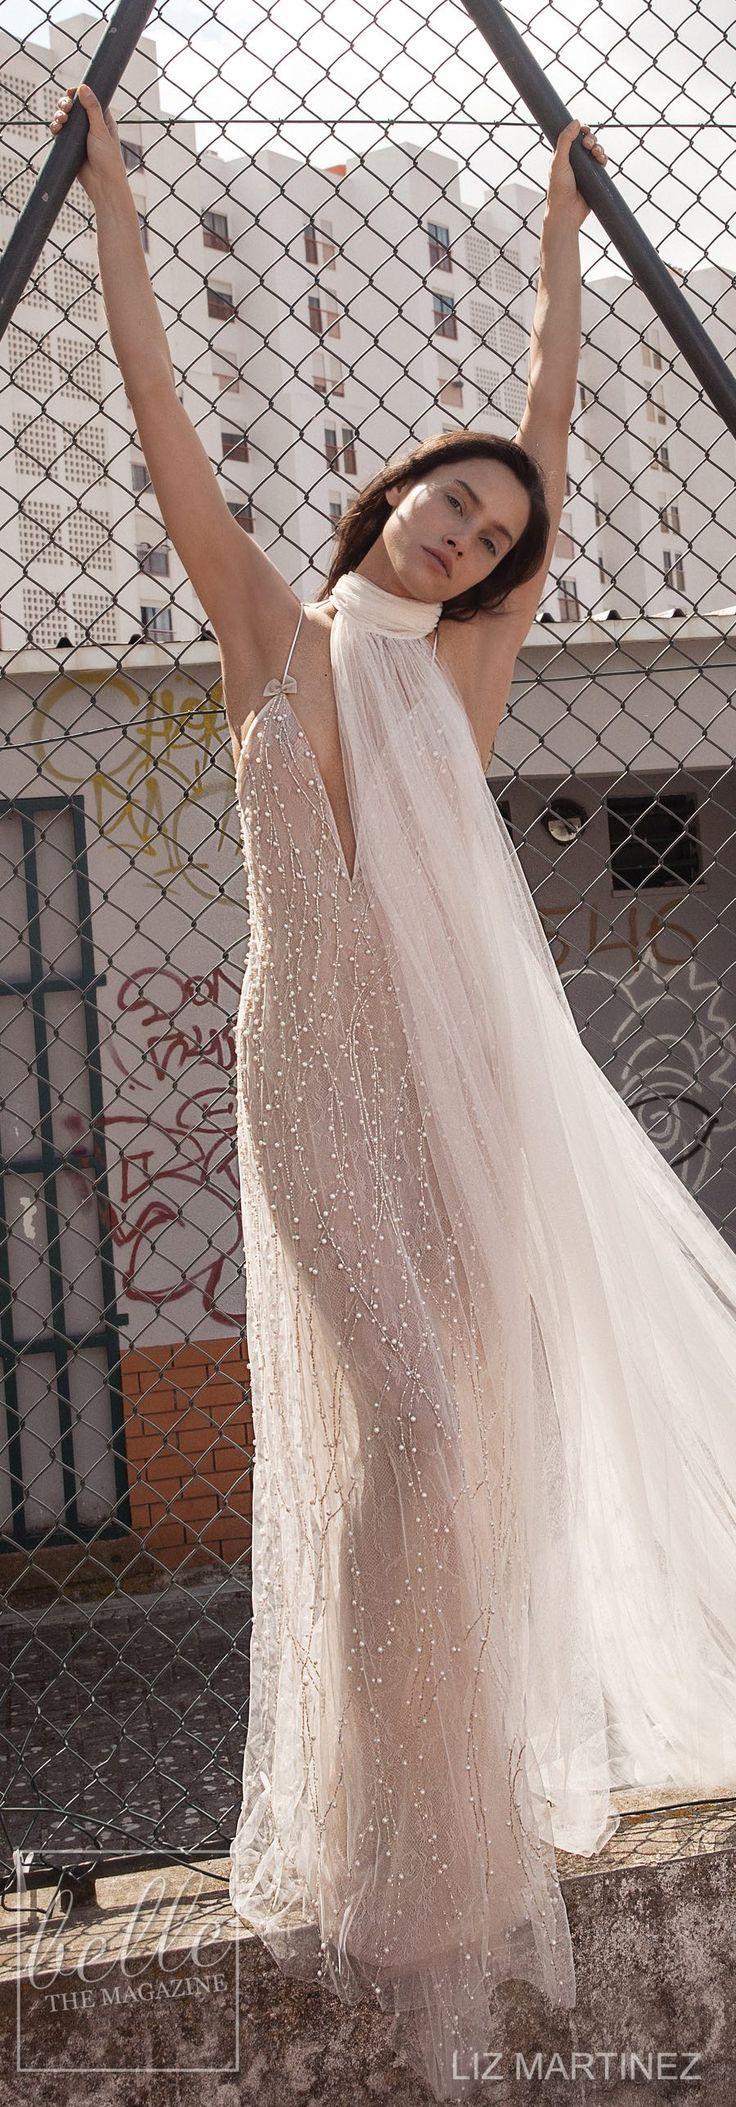 Wedding - Wedding Dresses By Liz Martinez 2018 Bridal Collection